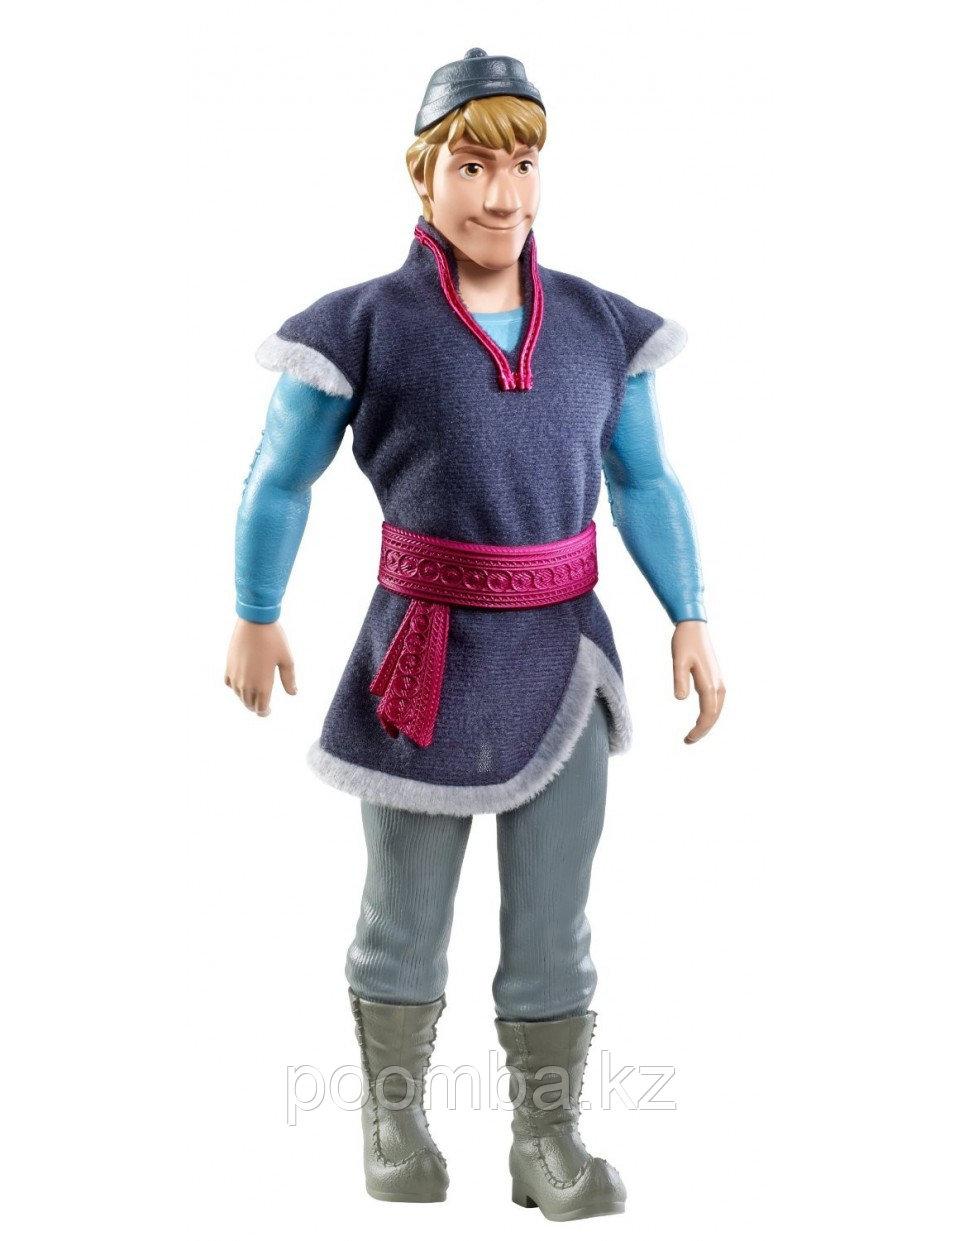 Кукла 'Кристофф, альпинист' (Kristoff), Frozen - Холодное сердце